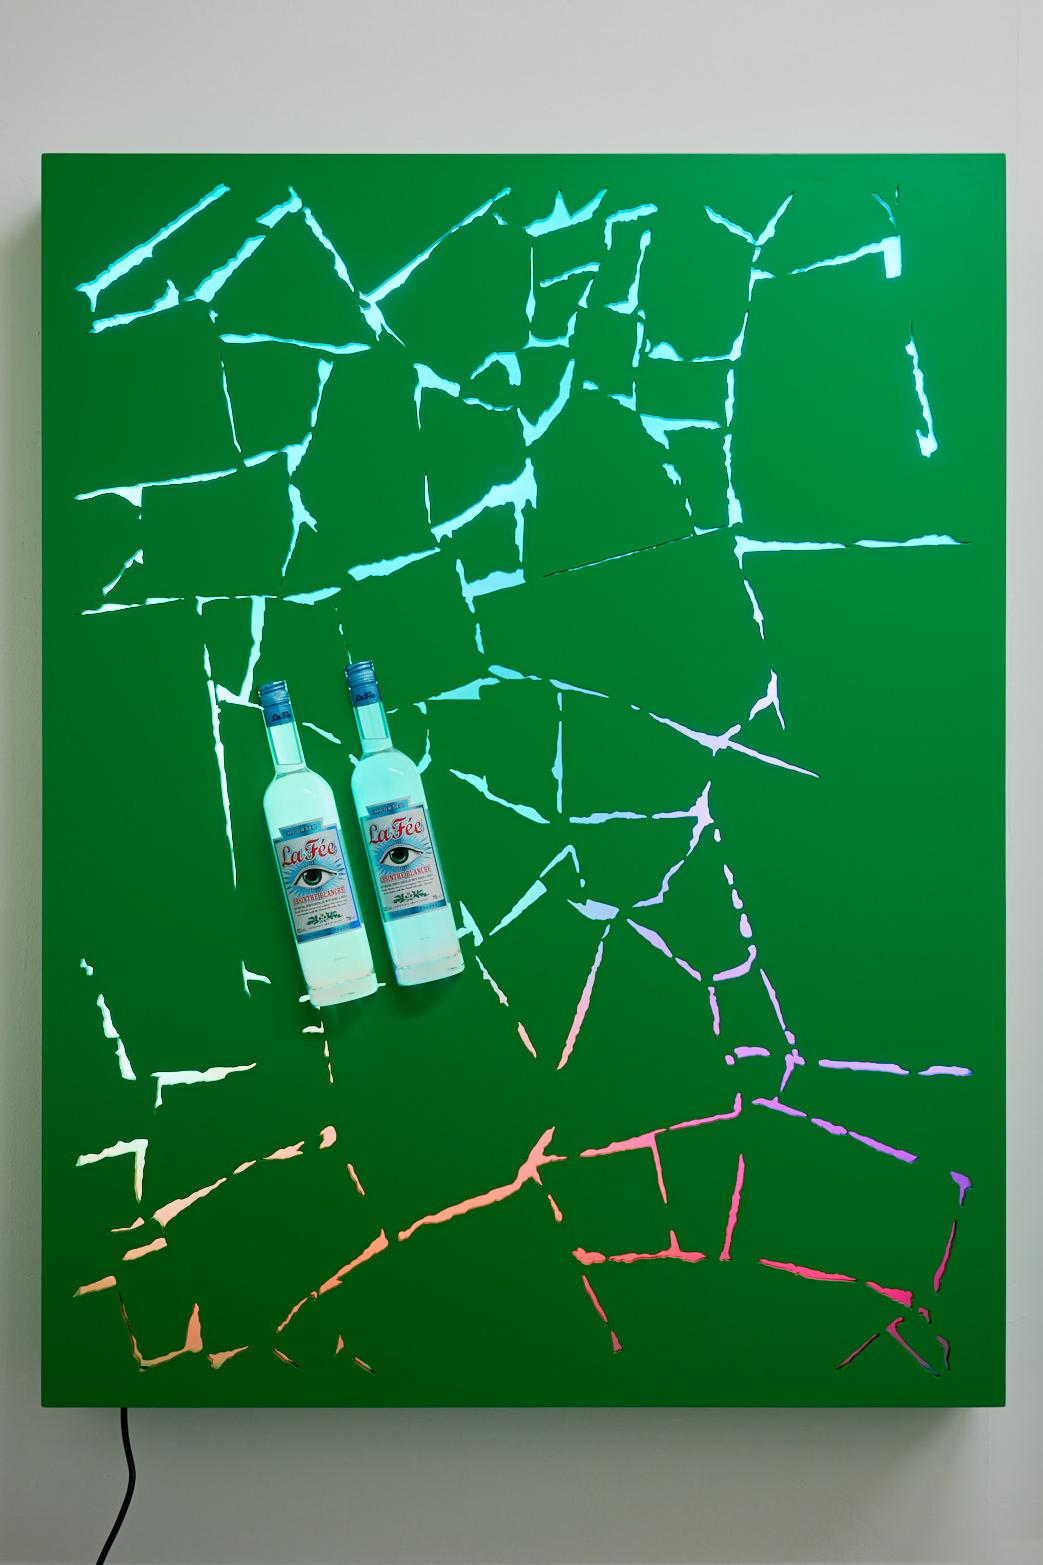 David Ferrando Giraut, V.4 - You Pass Through Walls Lacquered MDF and wood, LED lights, absinthe La Fée Vert. 130 X 100 cm,2015.